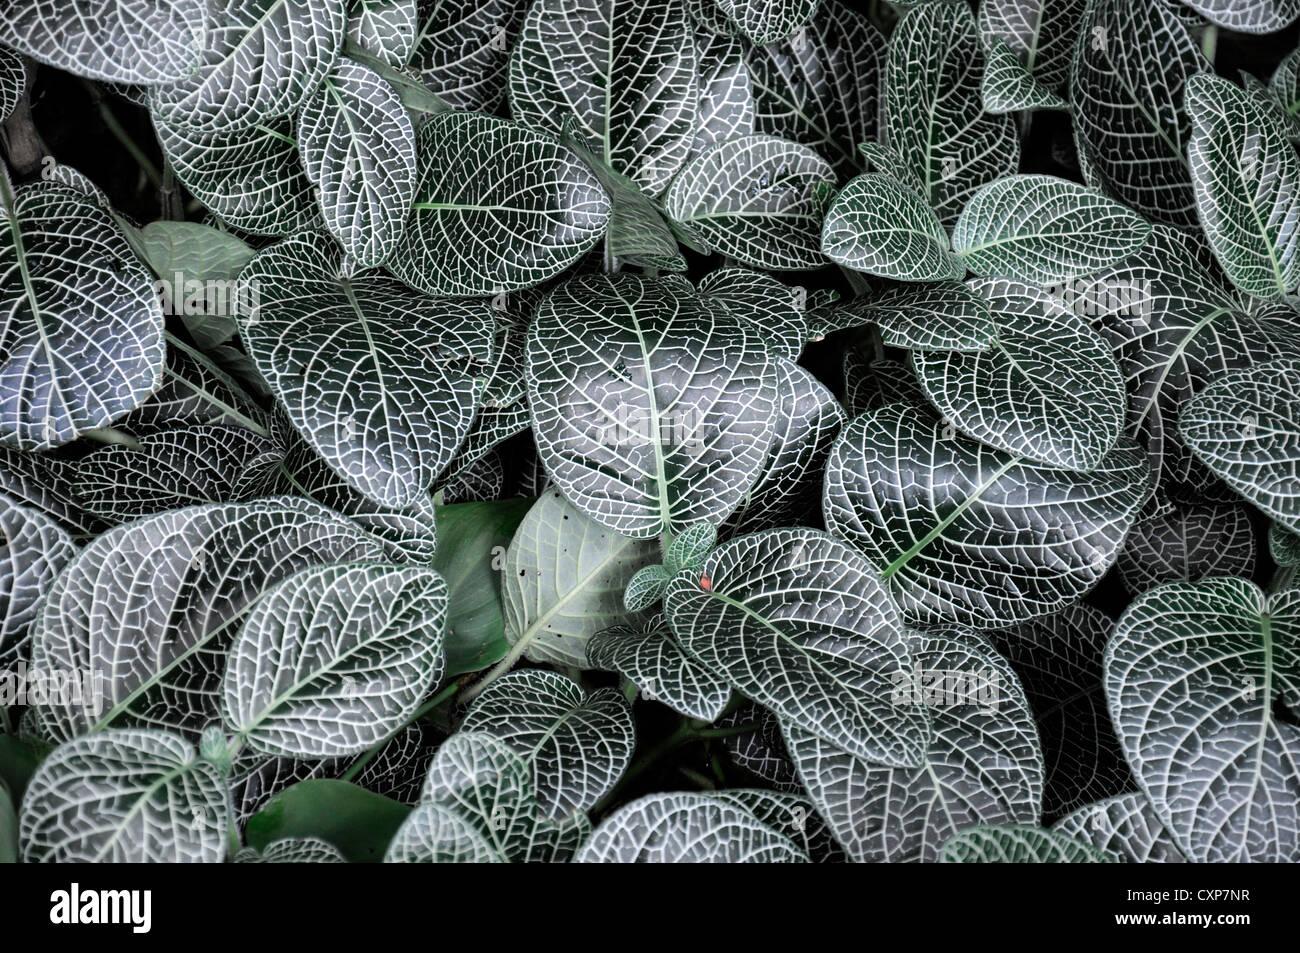 fittonia albivenis spring closeup selective plant portraits nerve plant mosaic leaves foliage patterned patterns - Stock Image